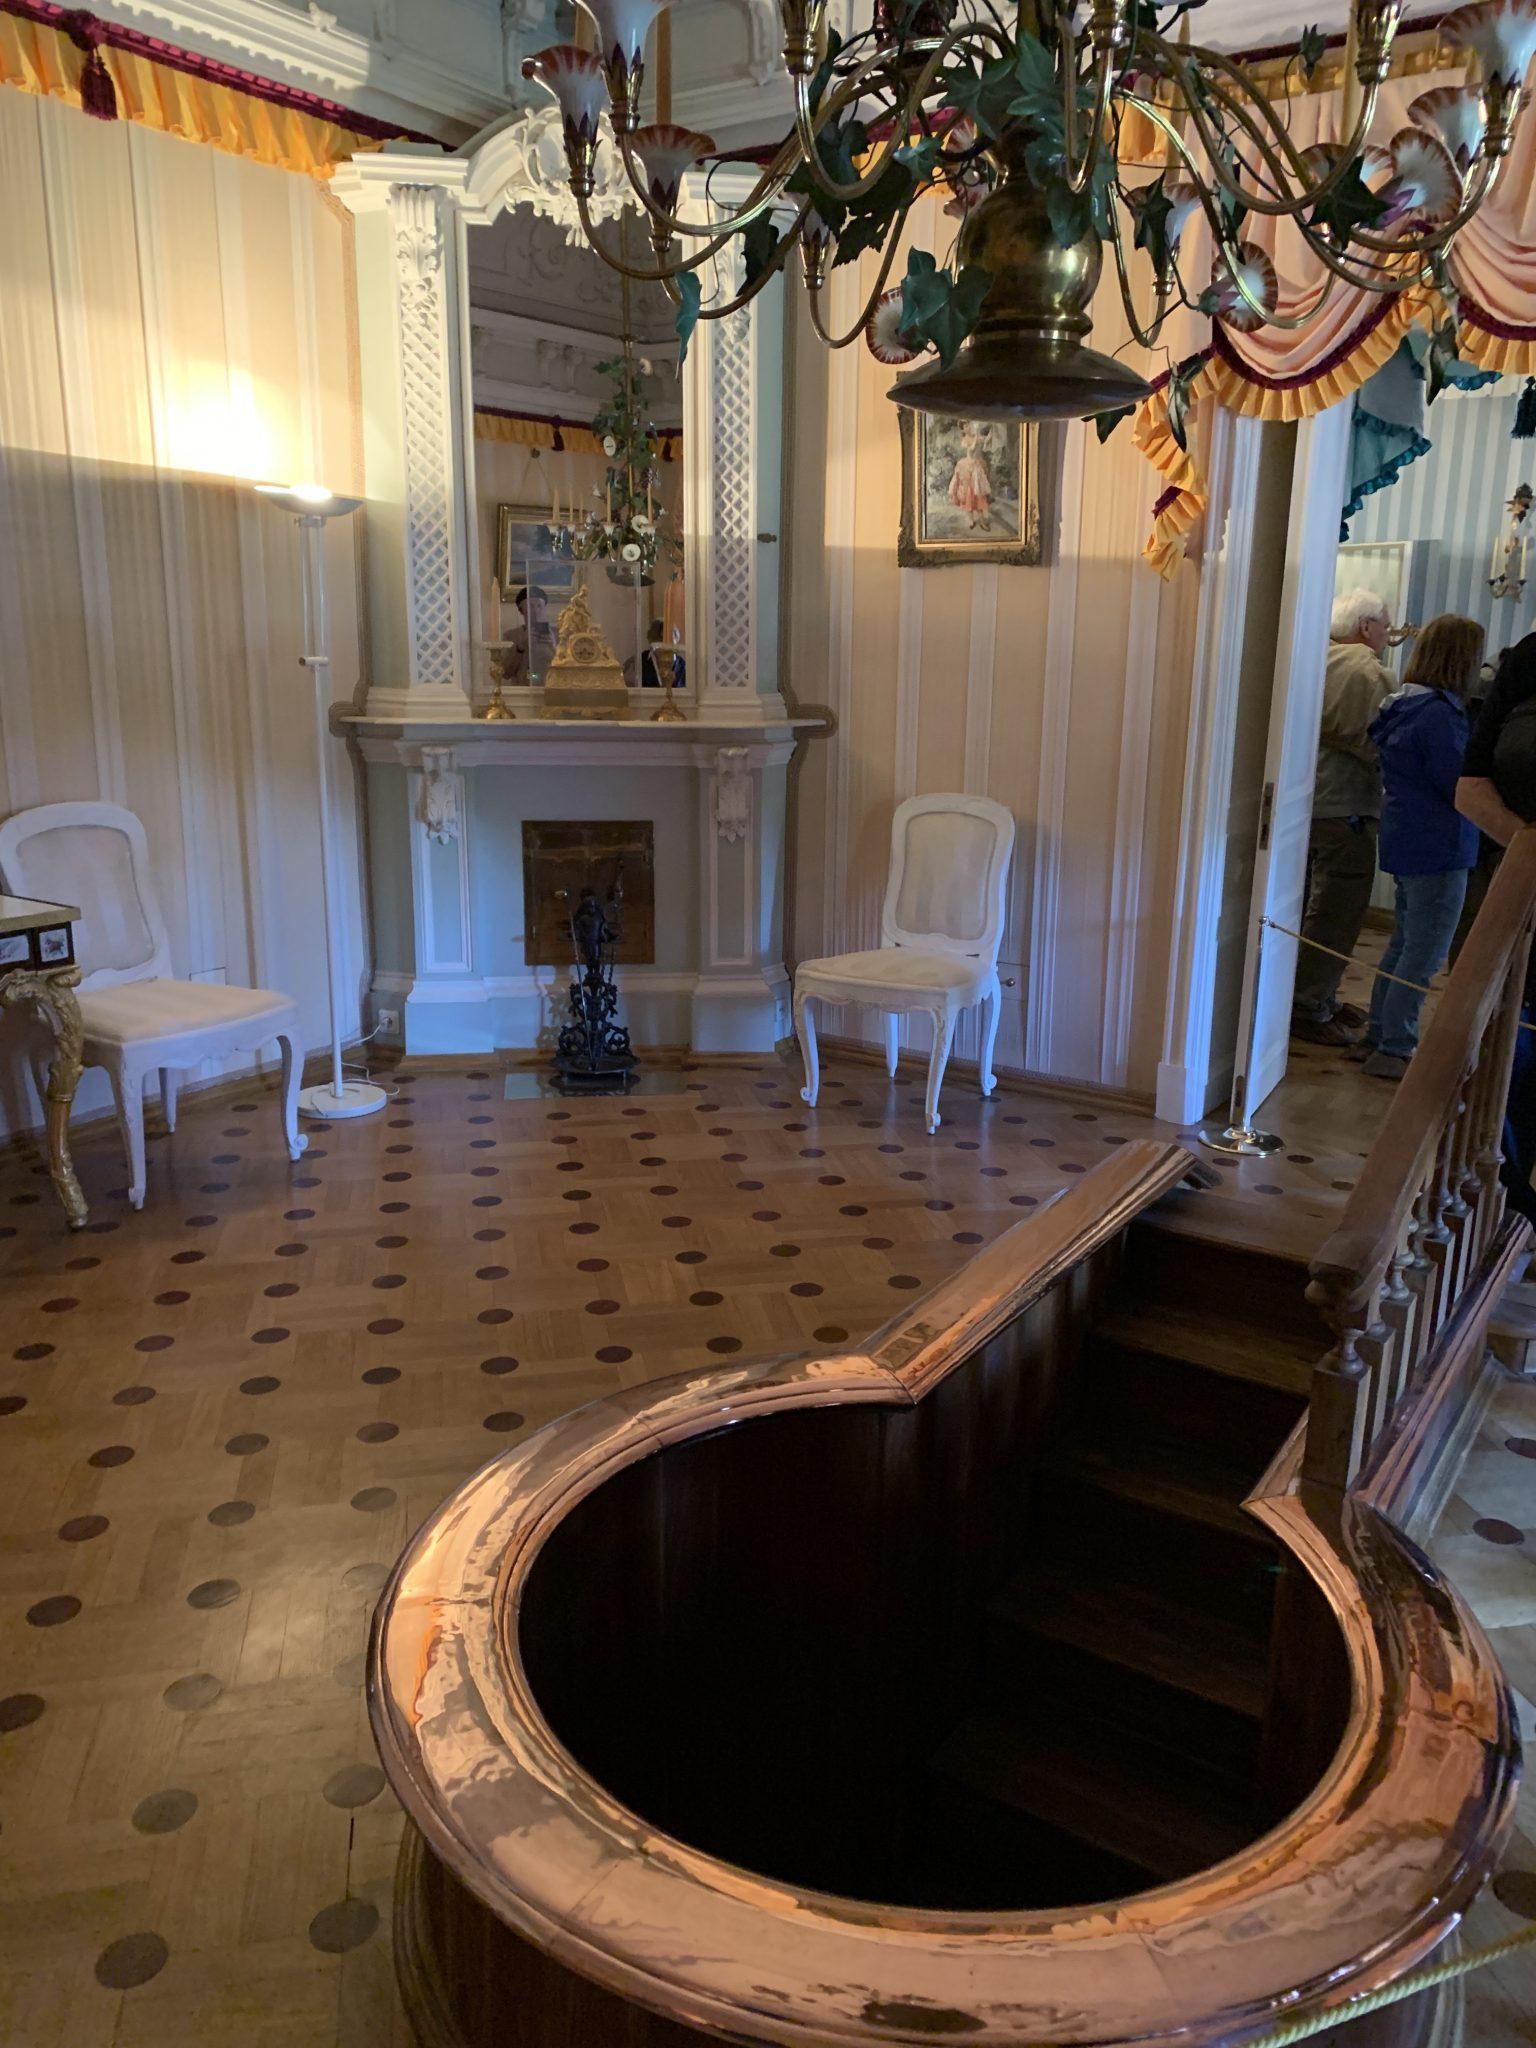 Monplaisir Peterhof Walk-in Tub